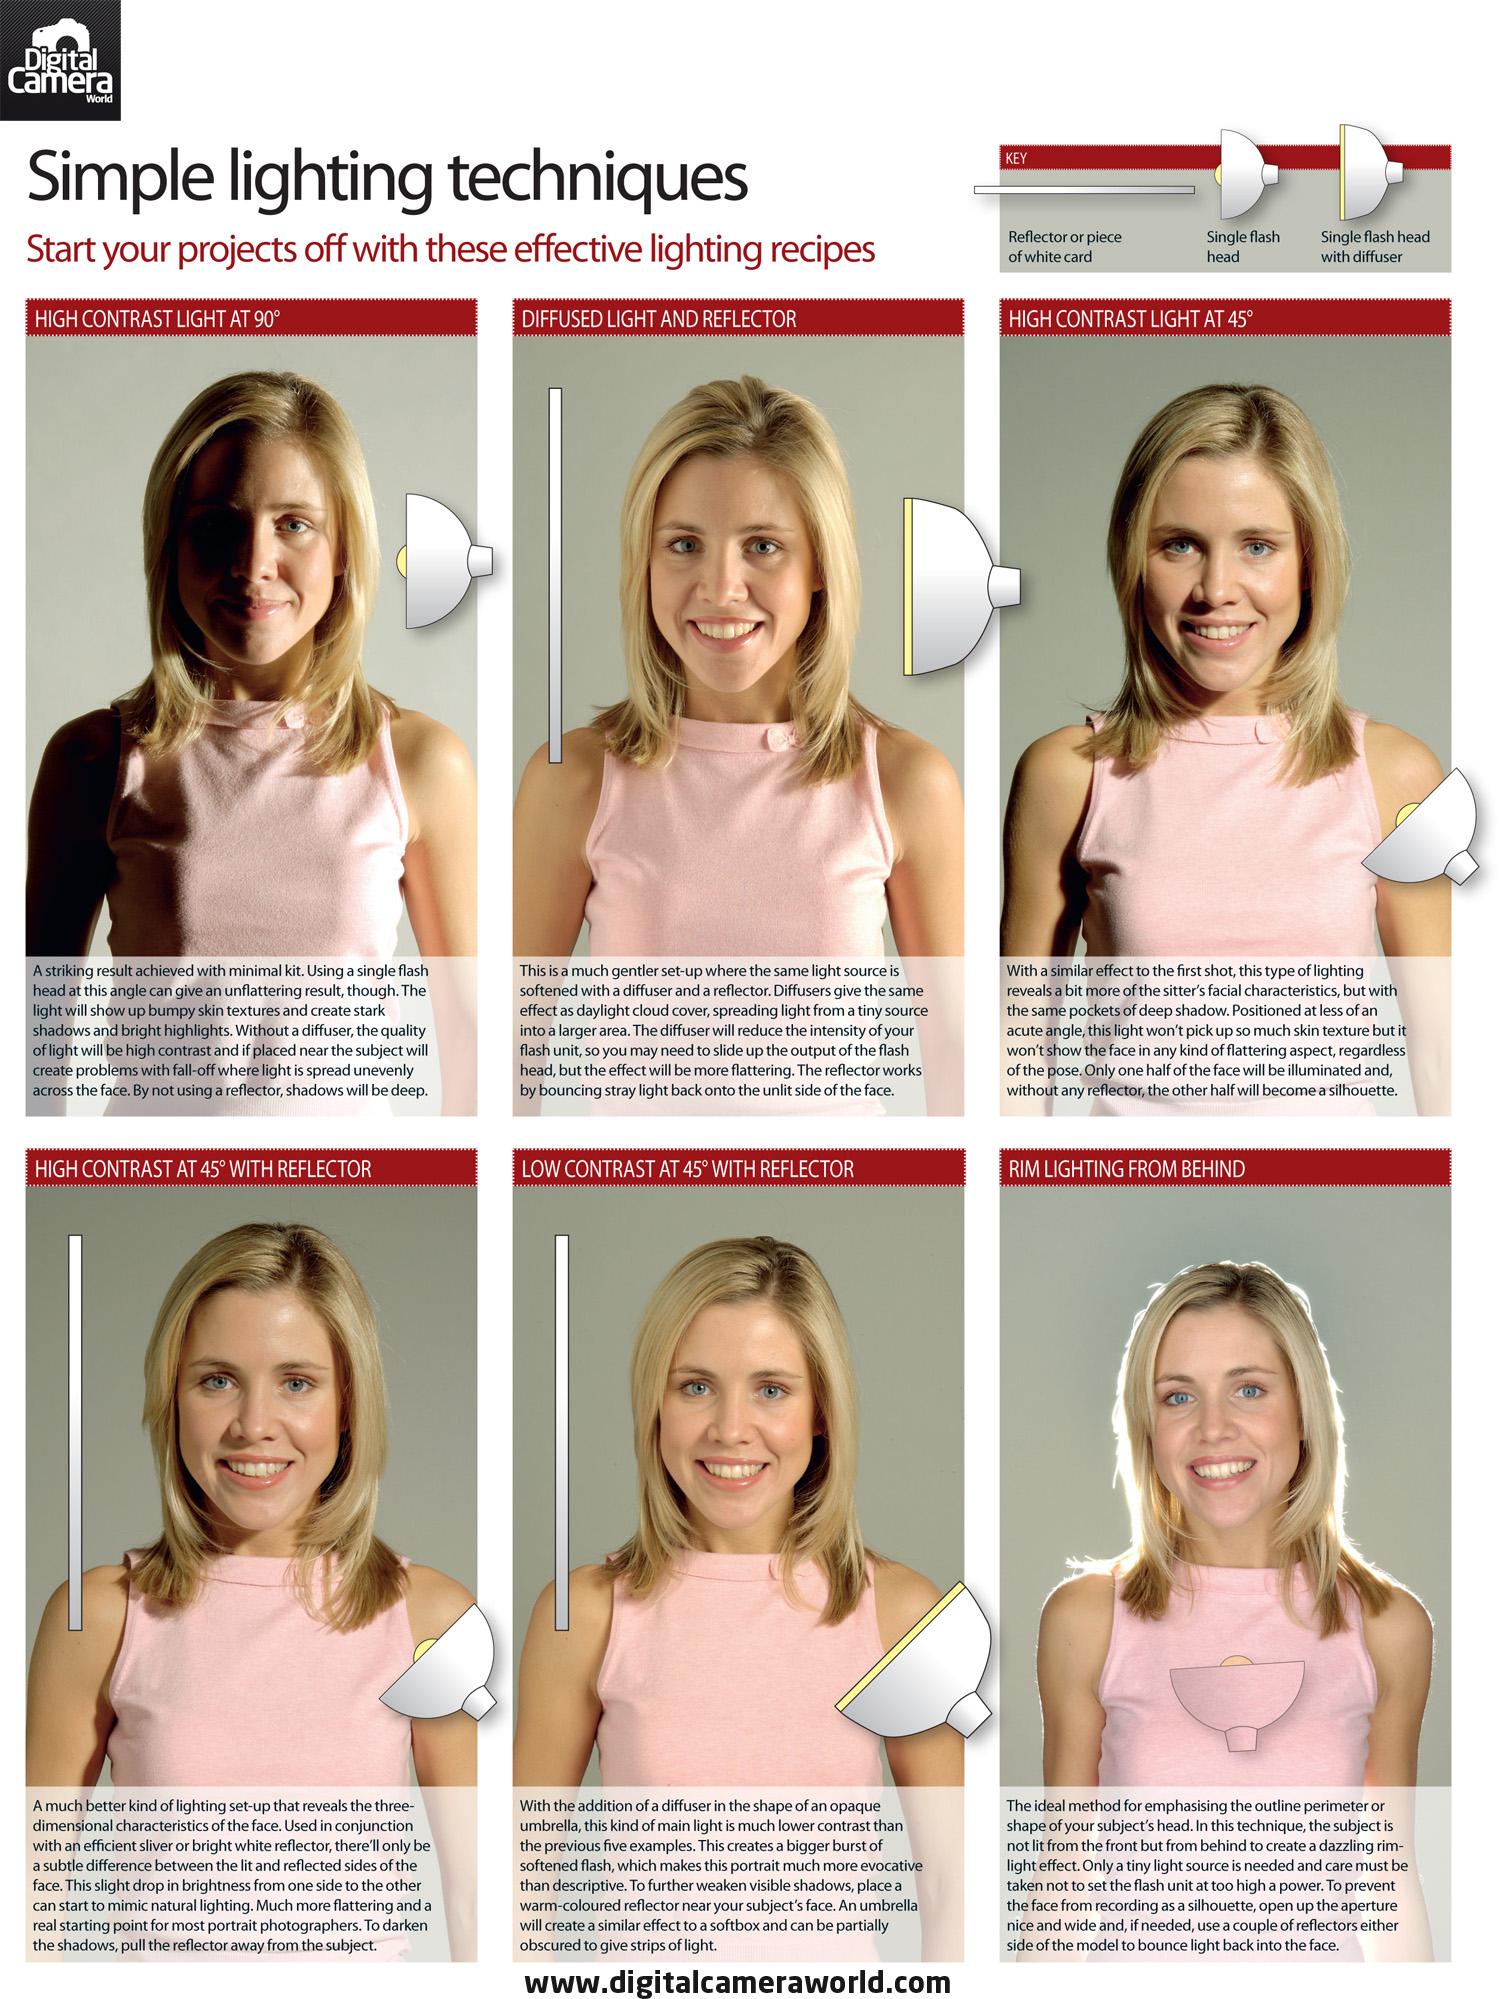 6 simple lighting setups for shooting portraits at home (plus free cheat sheet) | TechRadar  sc 1 st  TechRadar & 6 simple lighting setups for shooting portraits at home (plus free ... azcodes.com